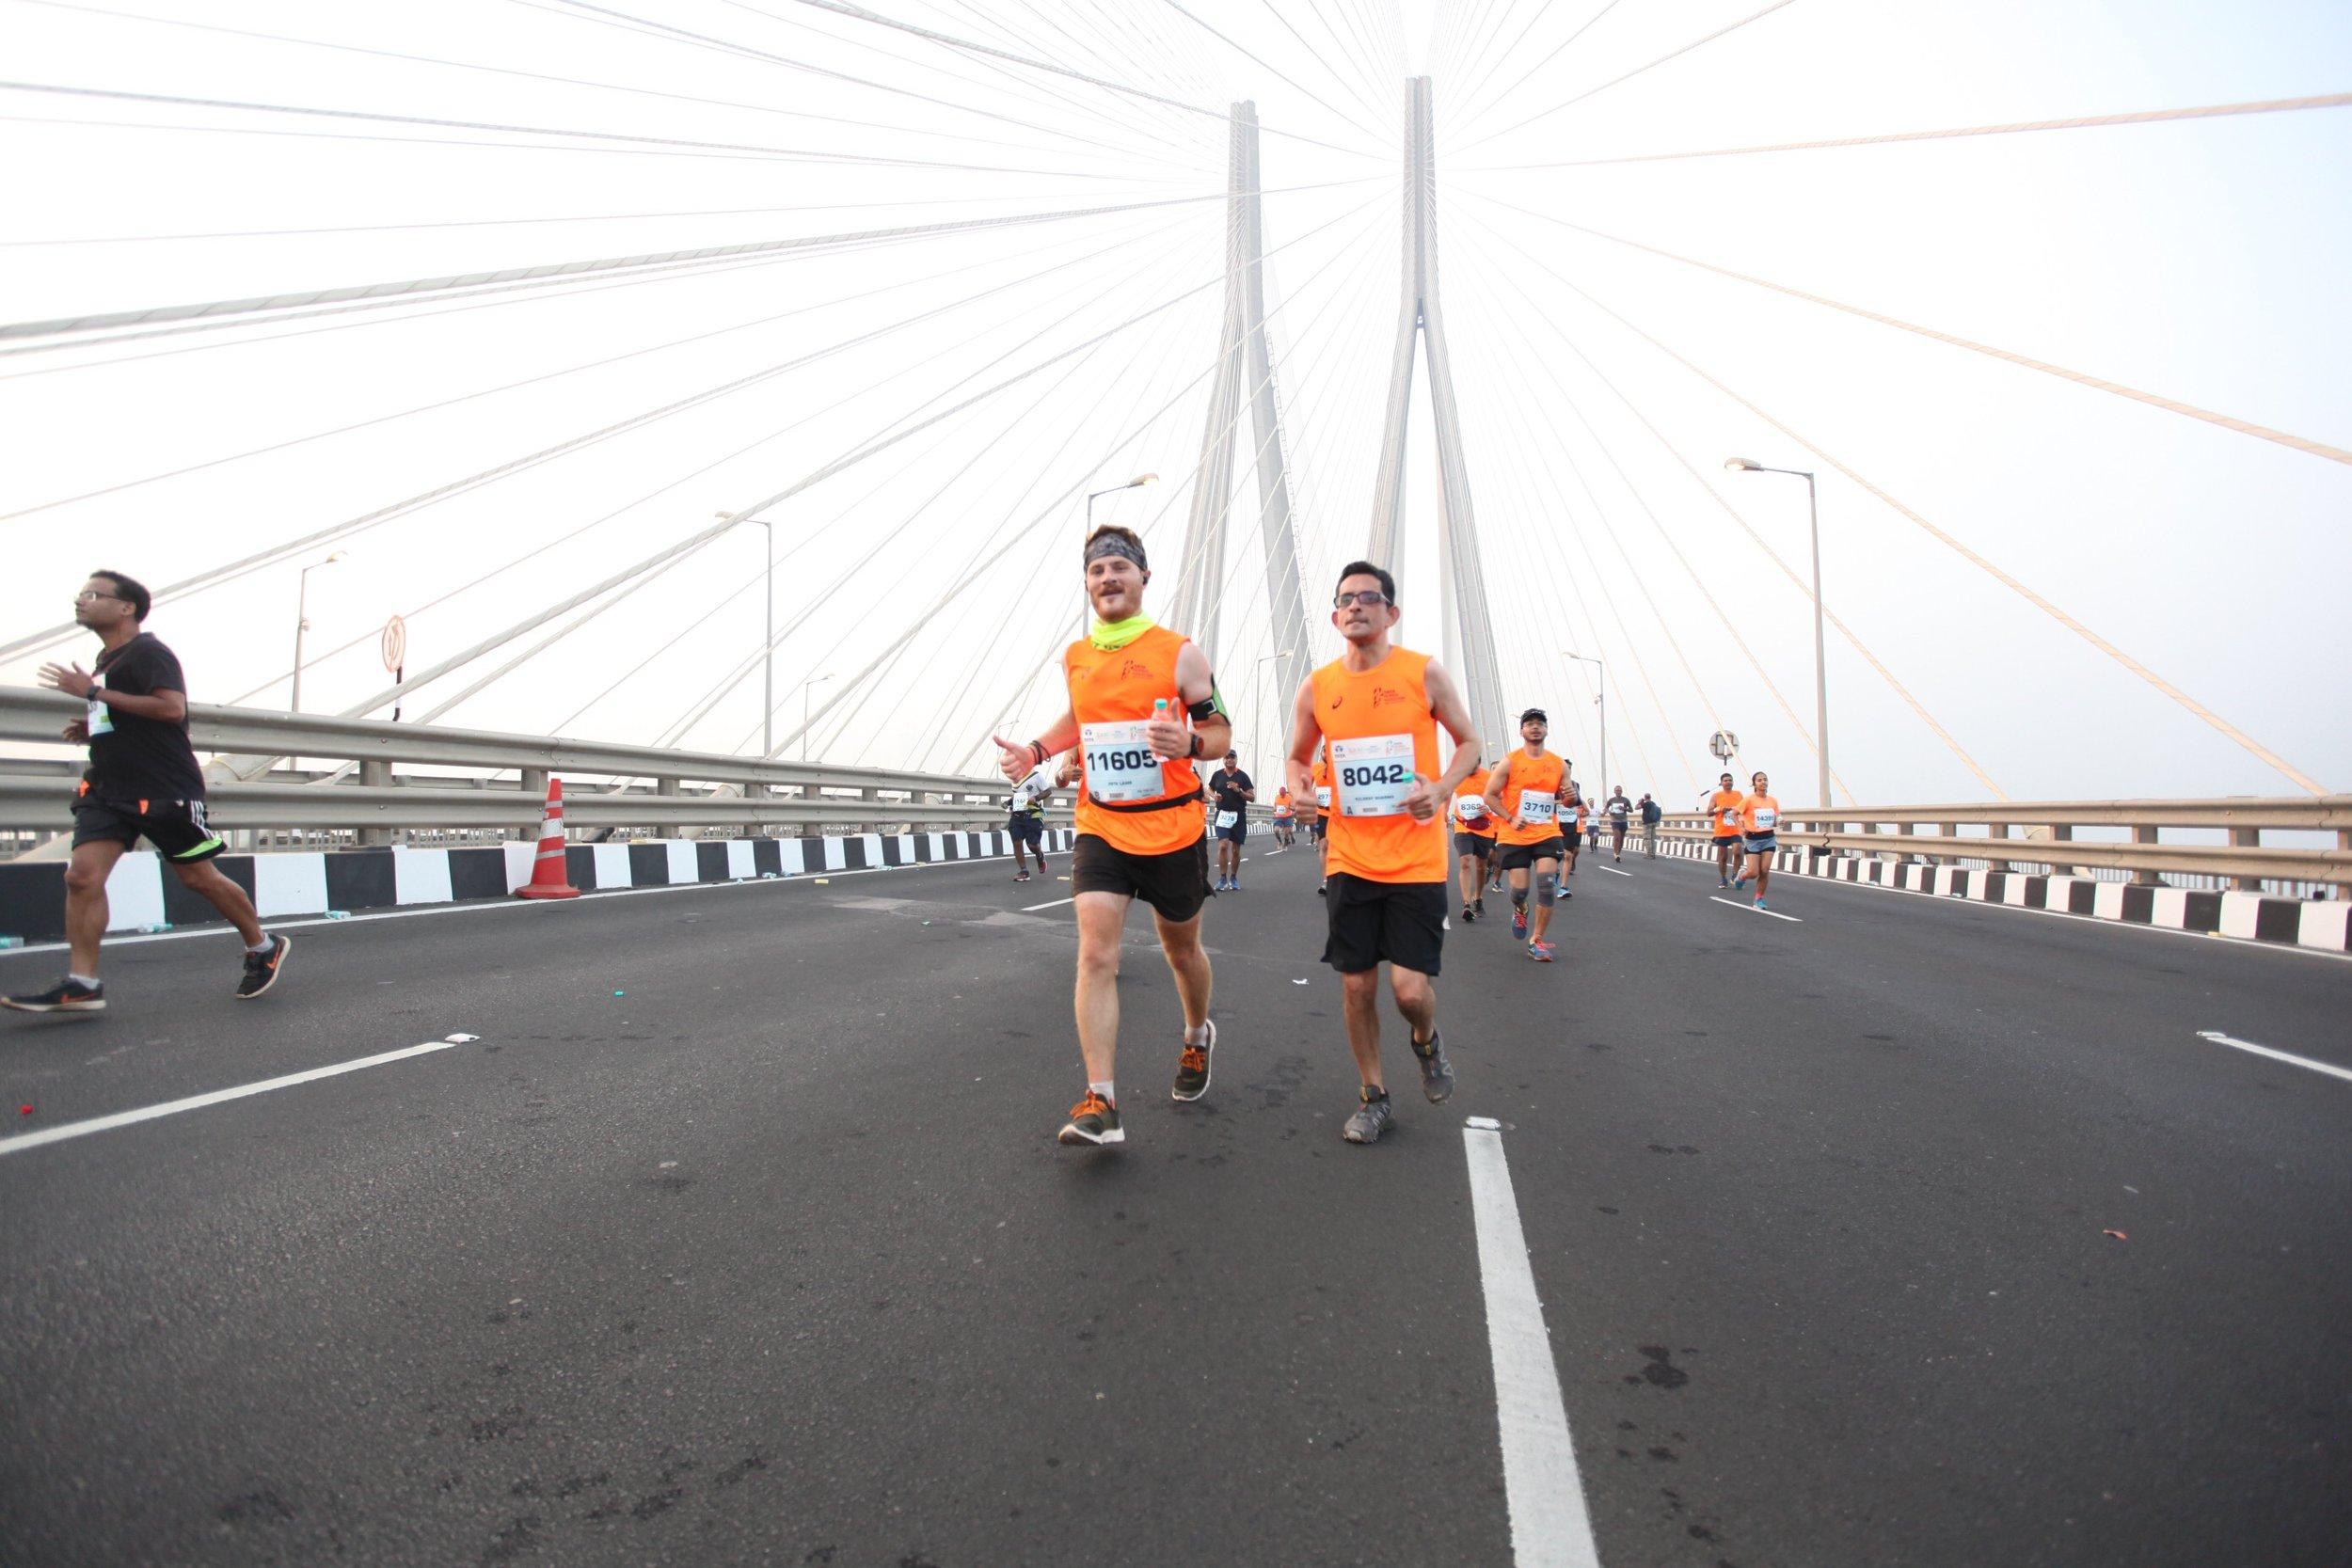 Worli sea link bridge